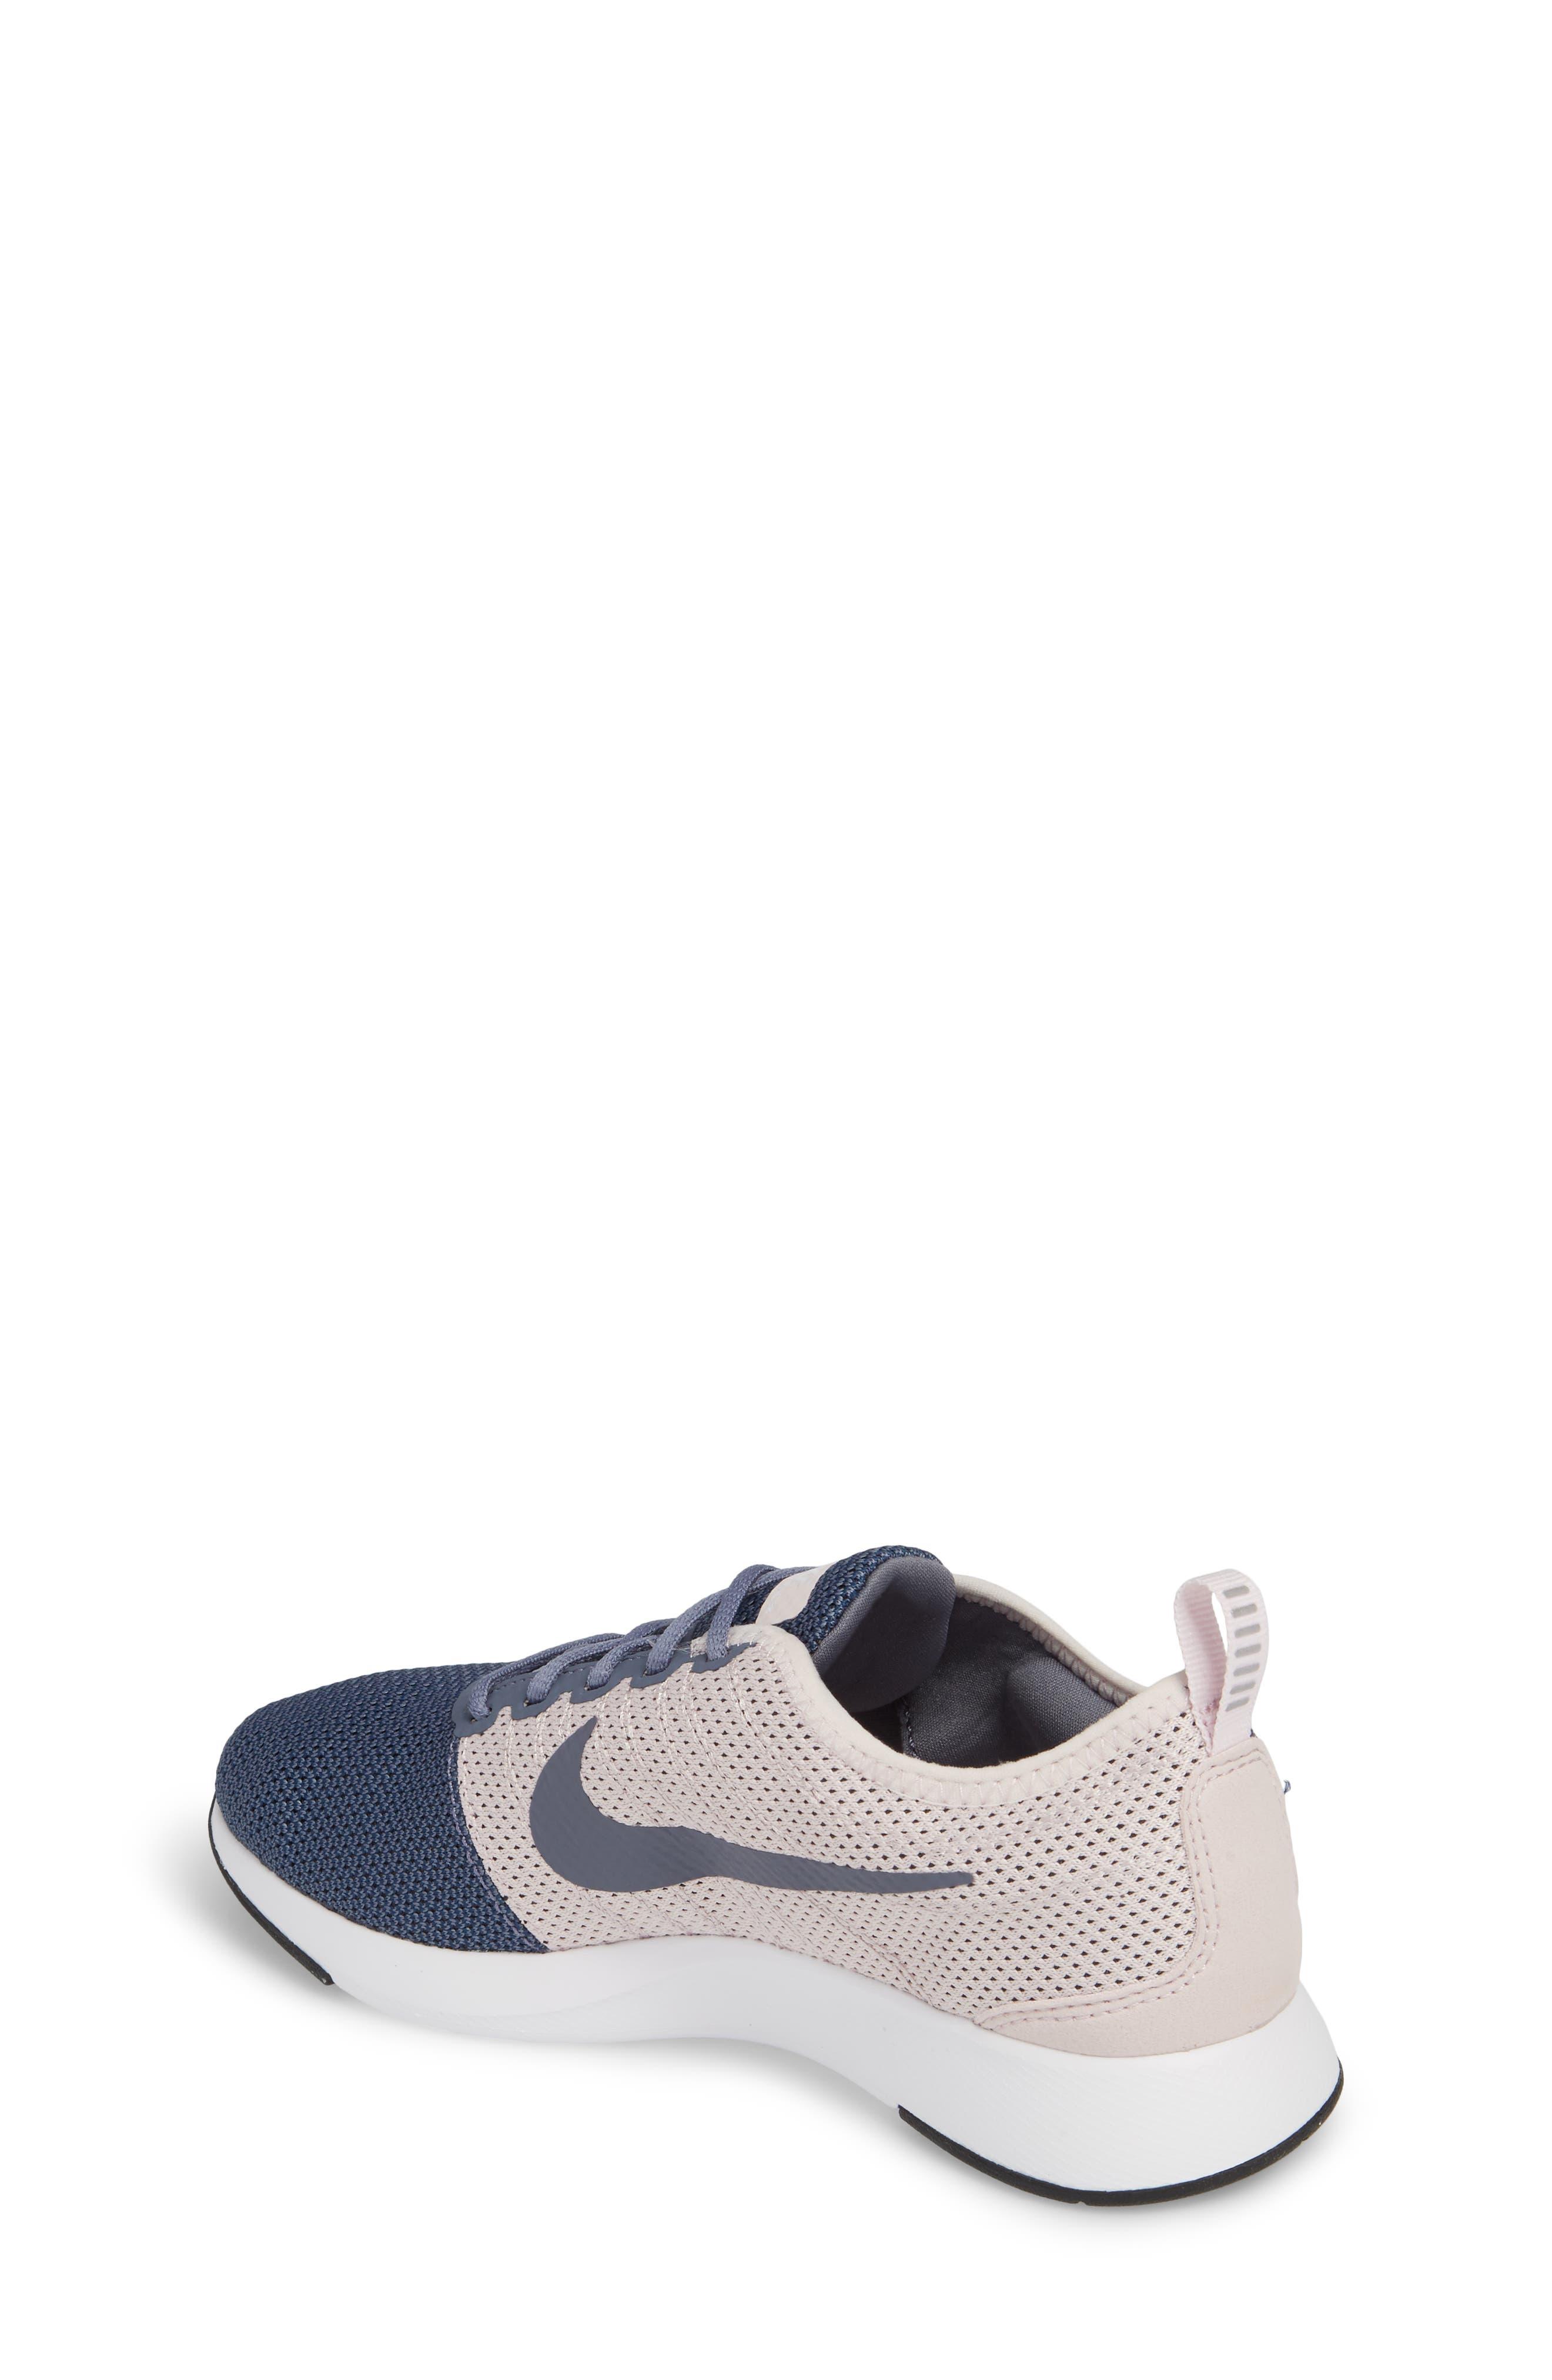 Dualtone Racer GS Sneaker,                             Alternate thumbnail 2, color,                             020